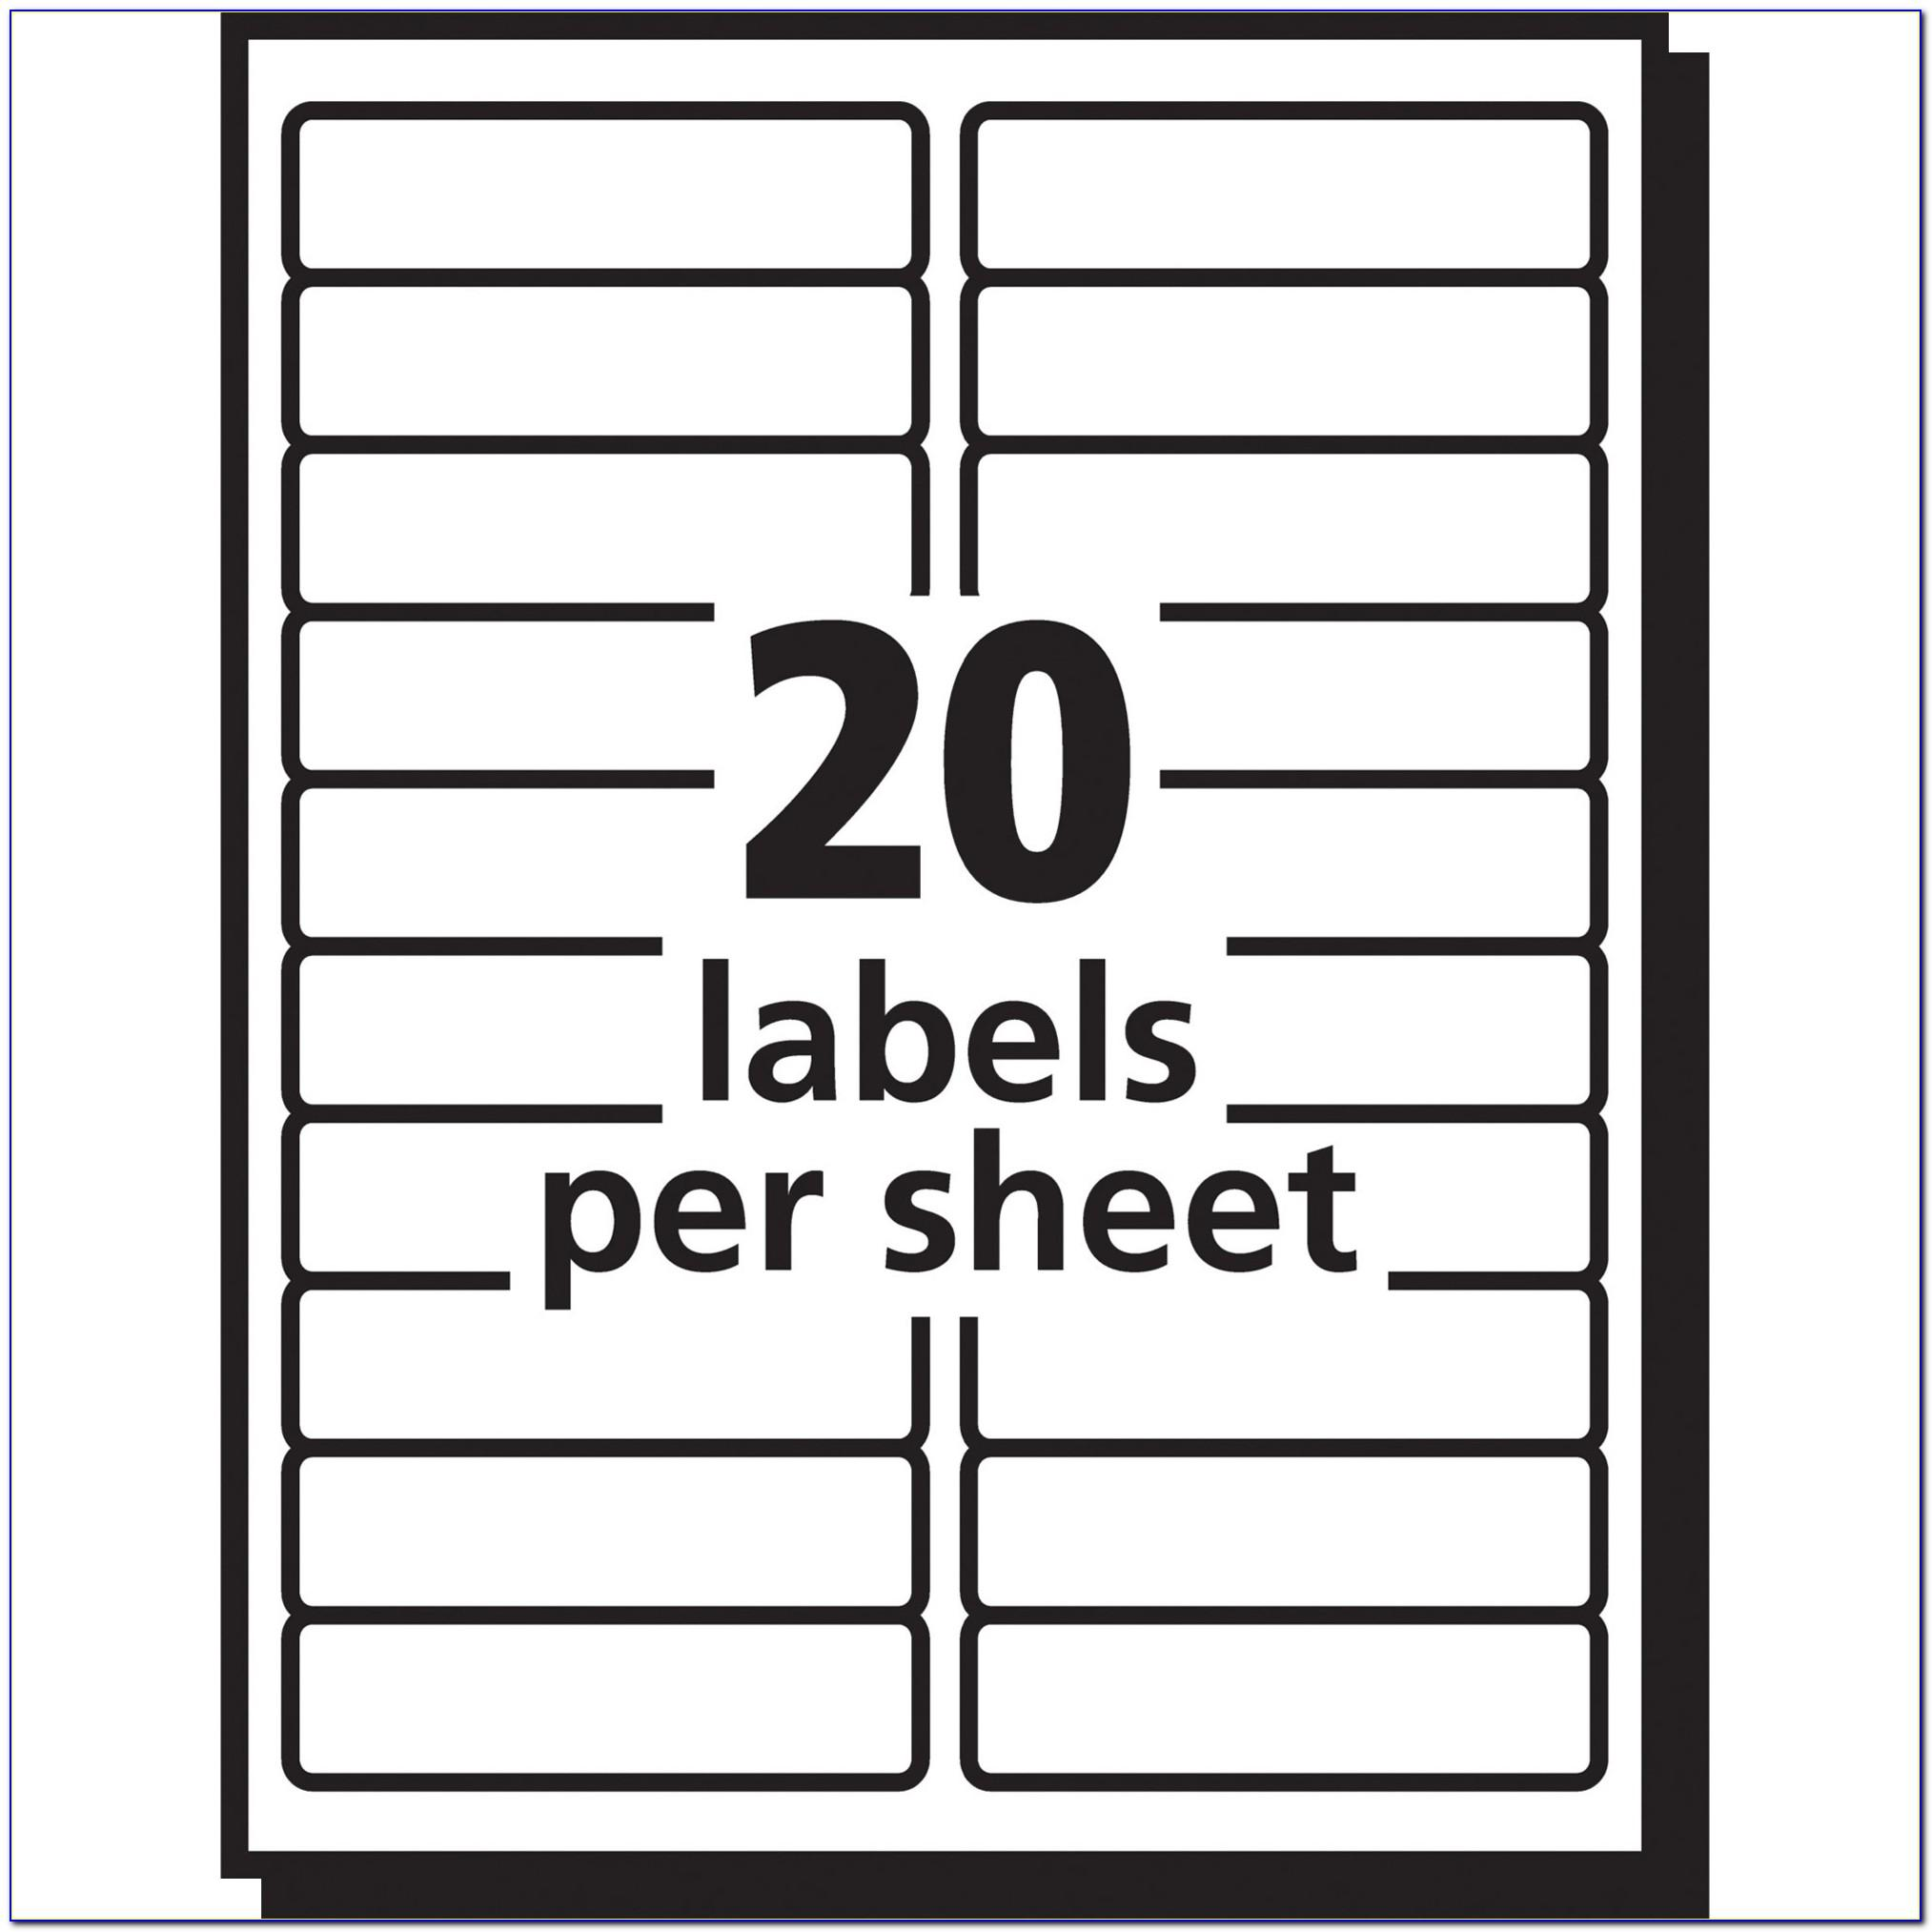 Avery Name Badge Template 6 Per Sheet